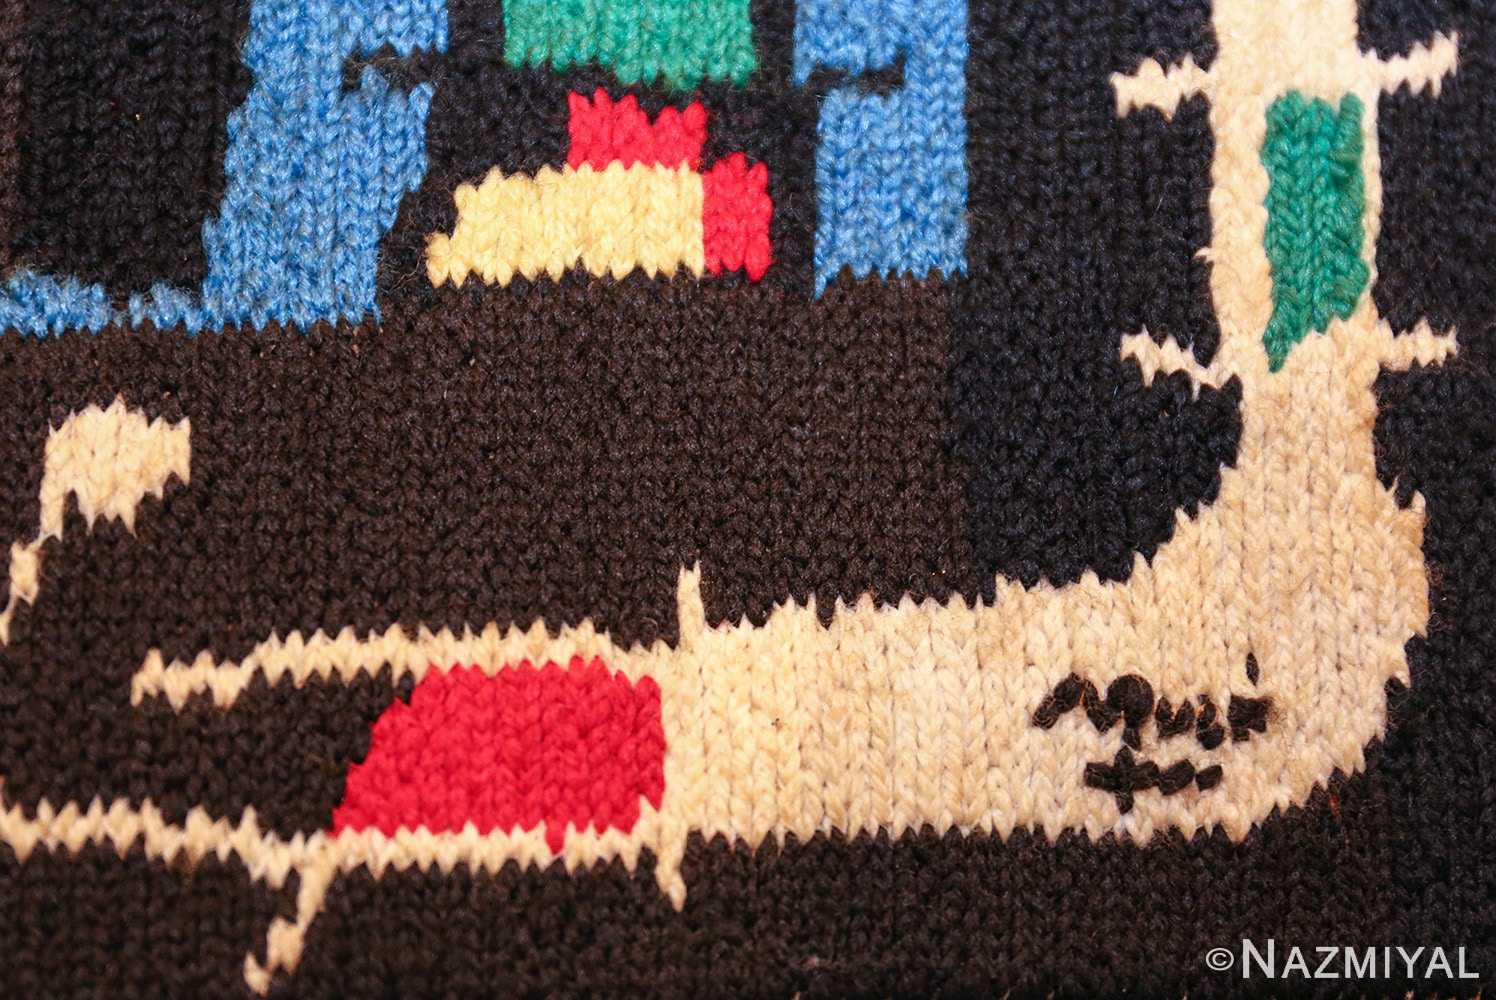 textile art tapestry by artist joan miro 48946 signature Nazmiyal